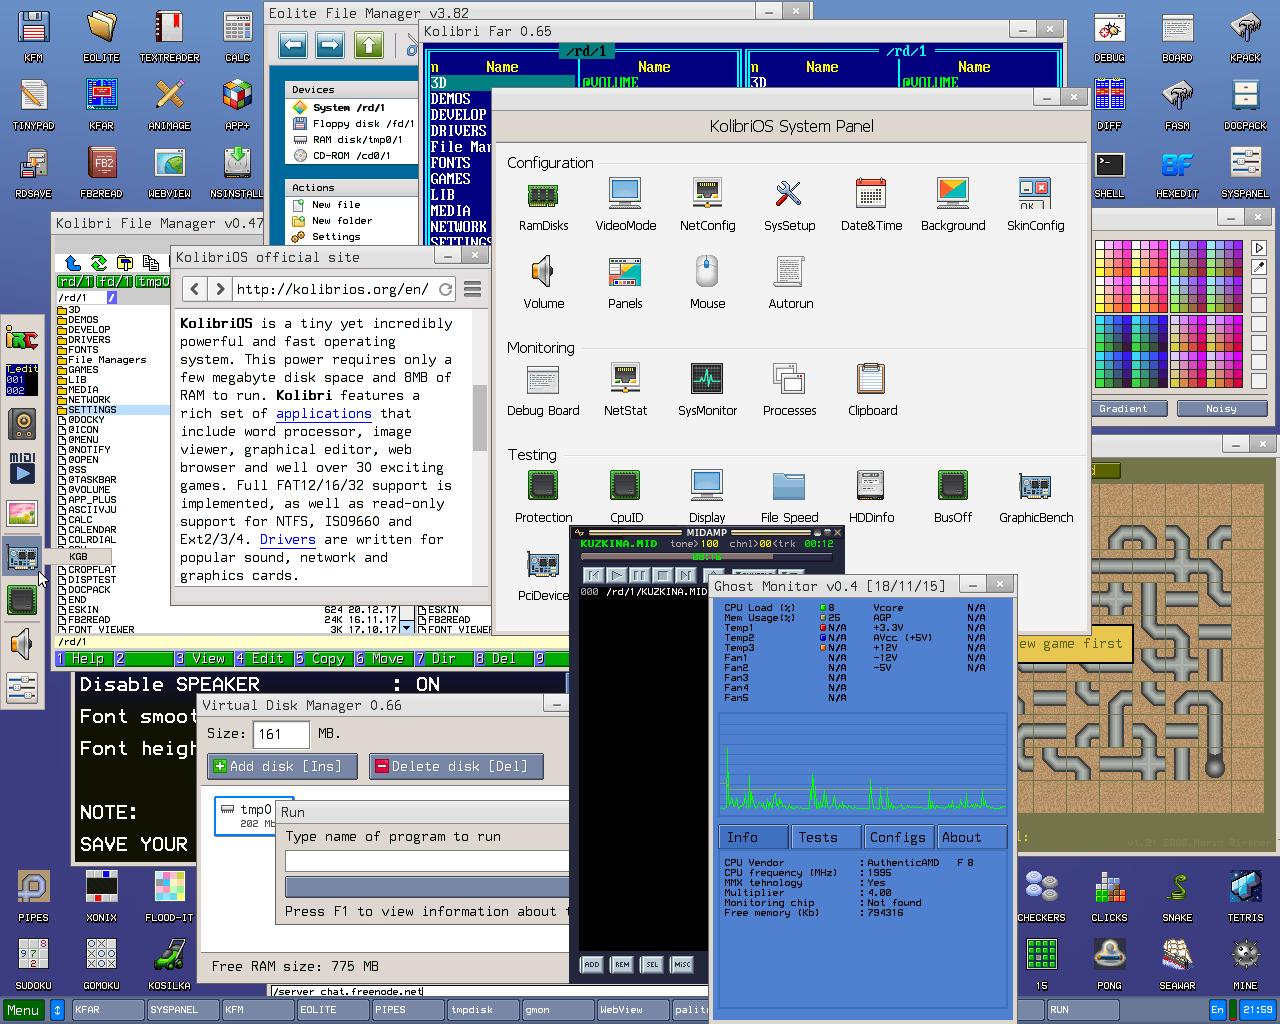 Software Design Anti-patterns - Coding Blocks